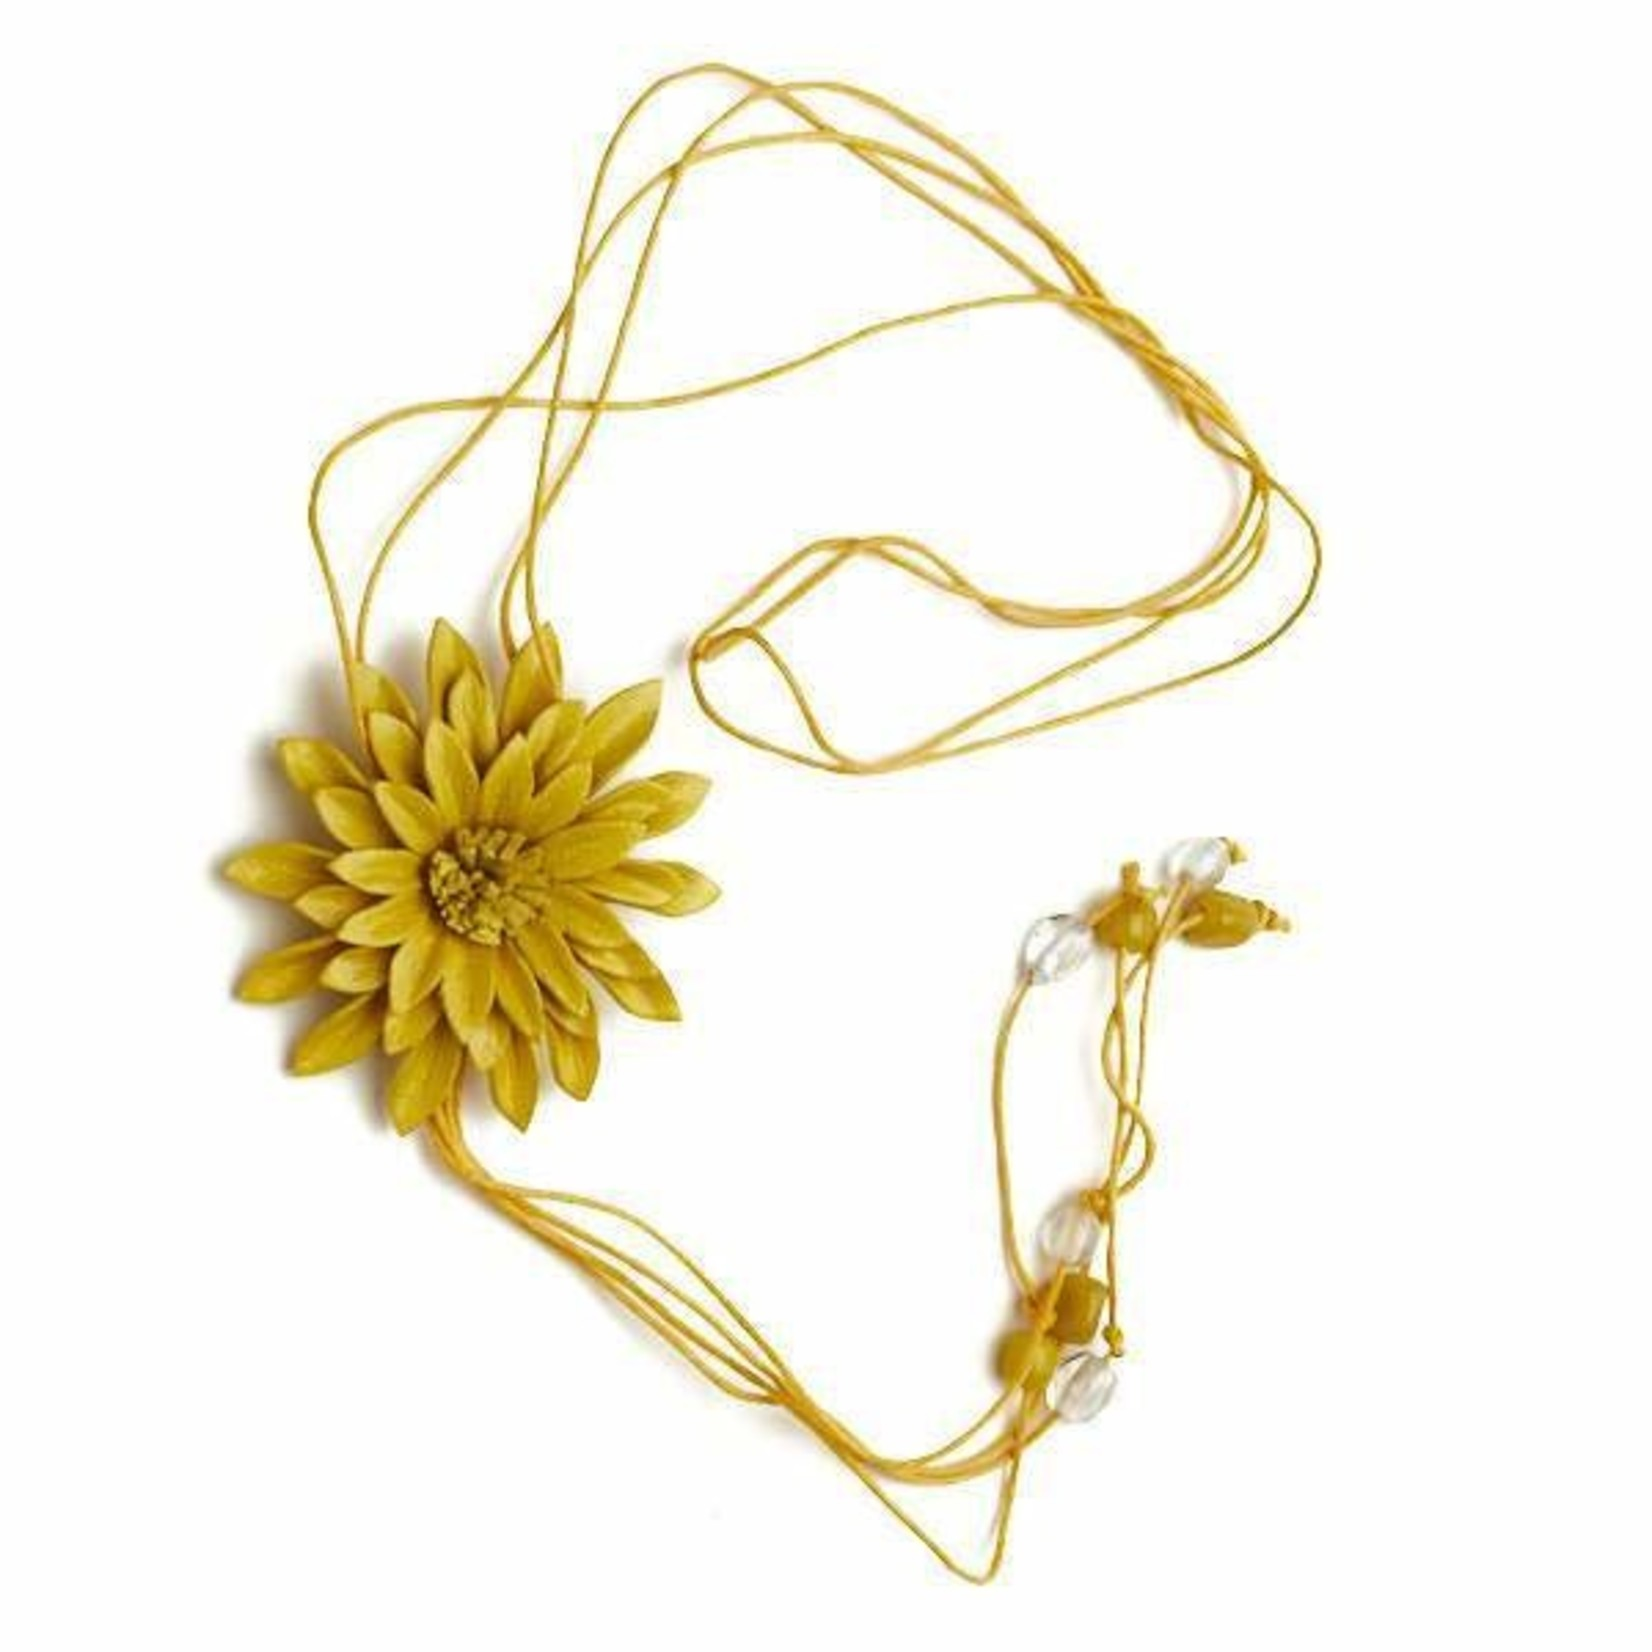 Suzie Blue Canada Leather Flower Necklace in Mustard